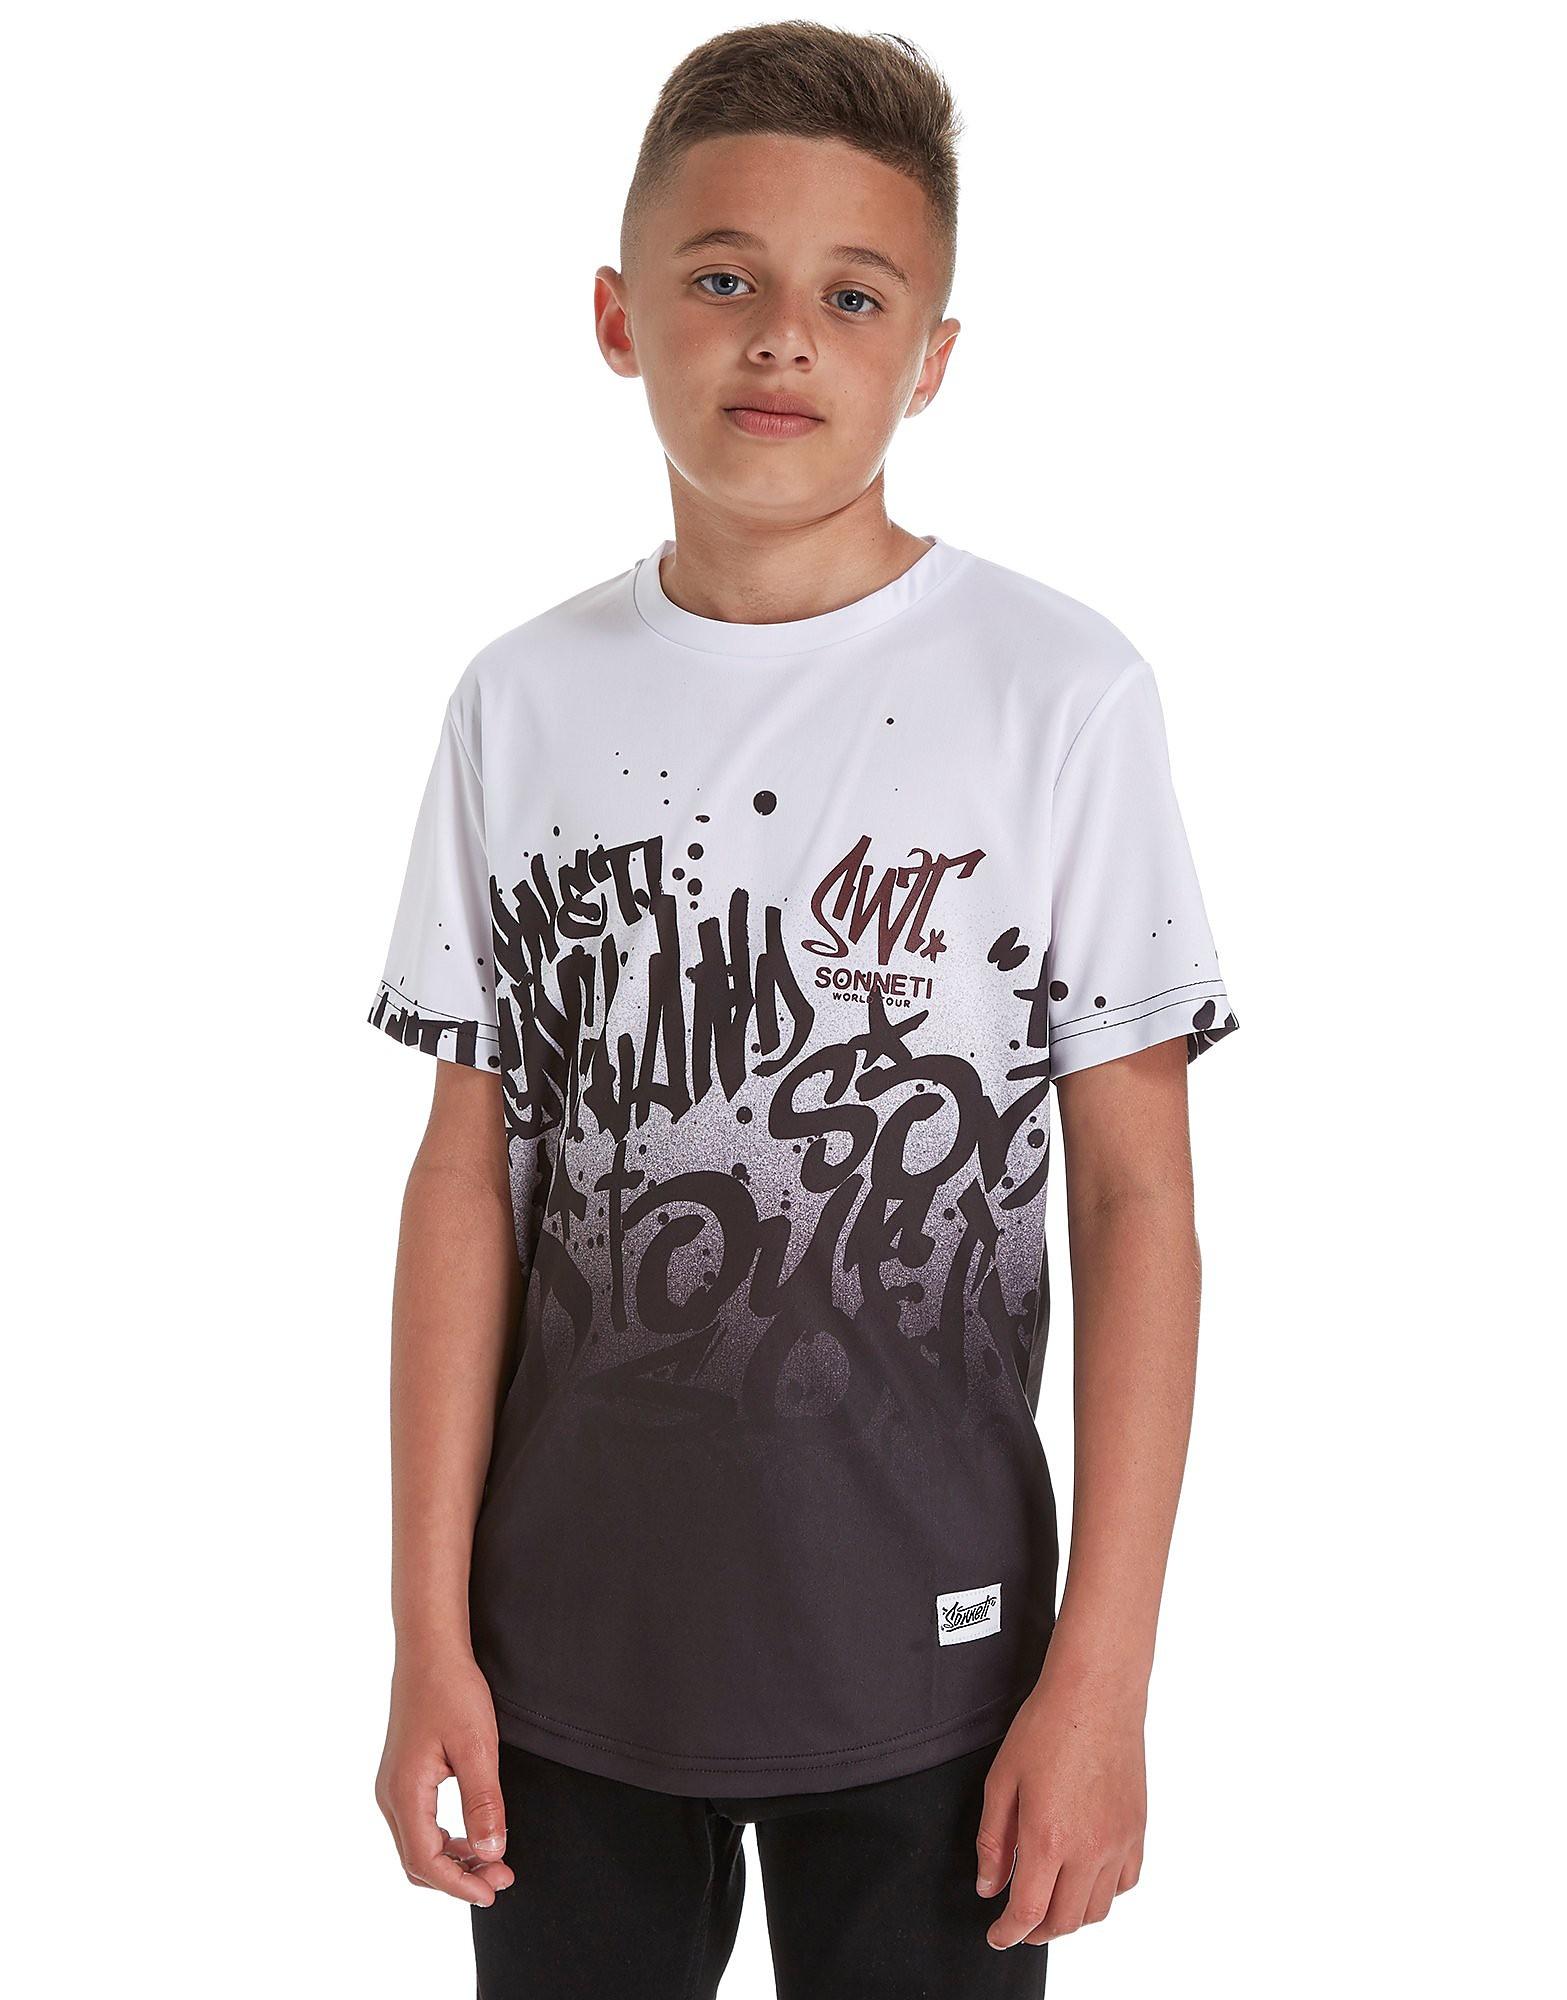 Sonneti Tagged T-Shirt